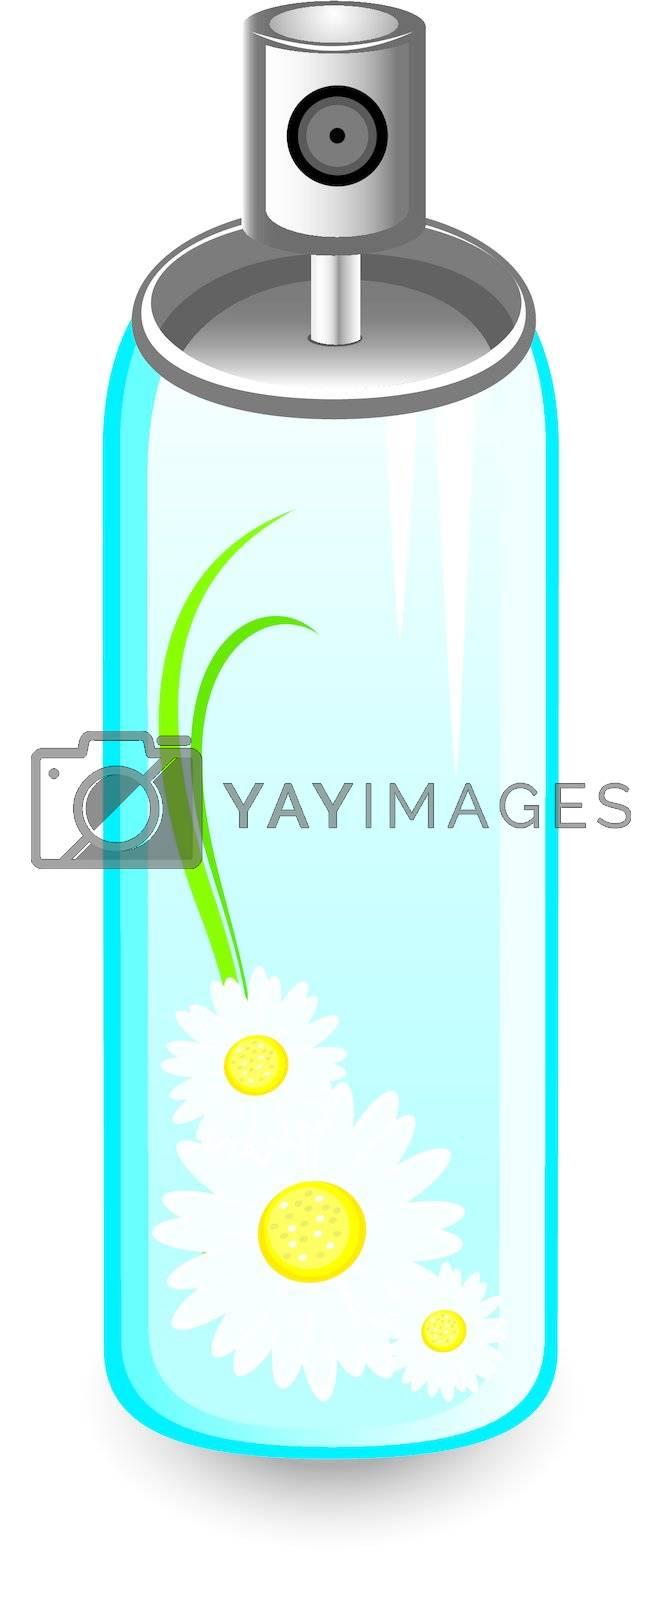 chamomile spray. Illustration on white background